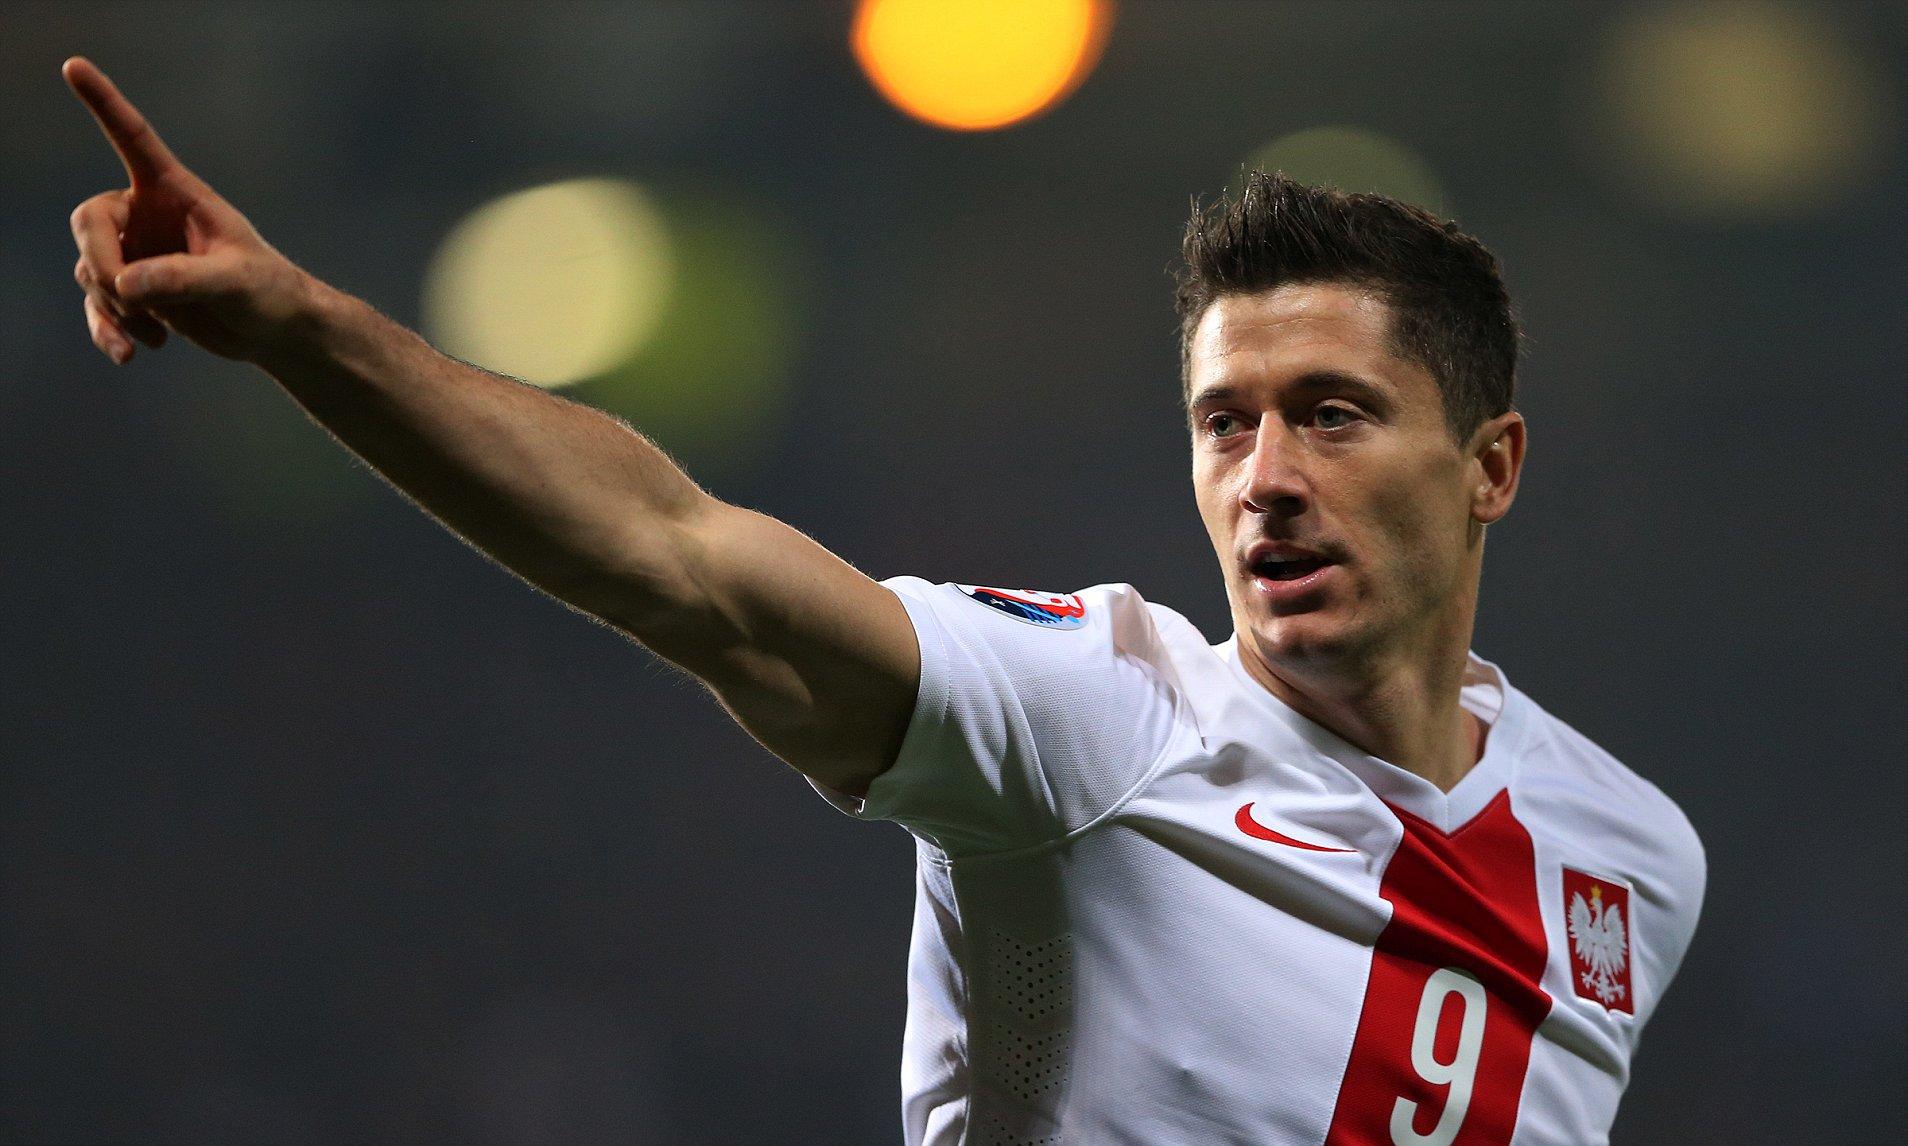 Poland's prolific number nine Robert Lewandowski